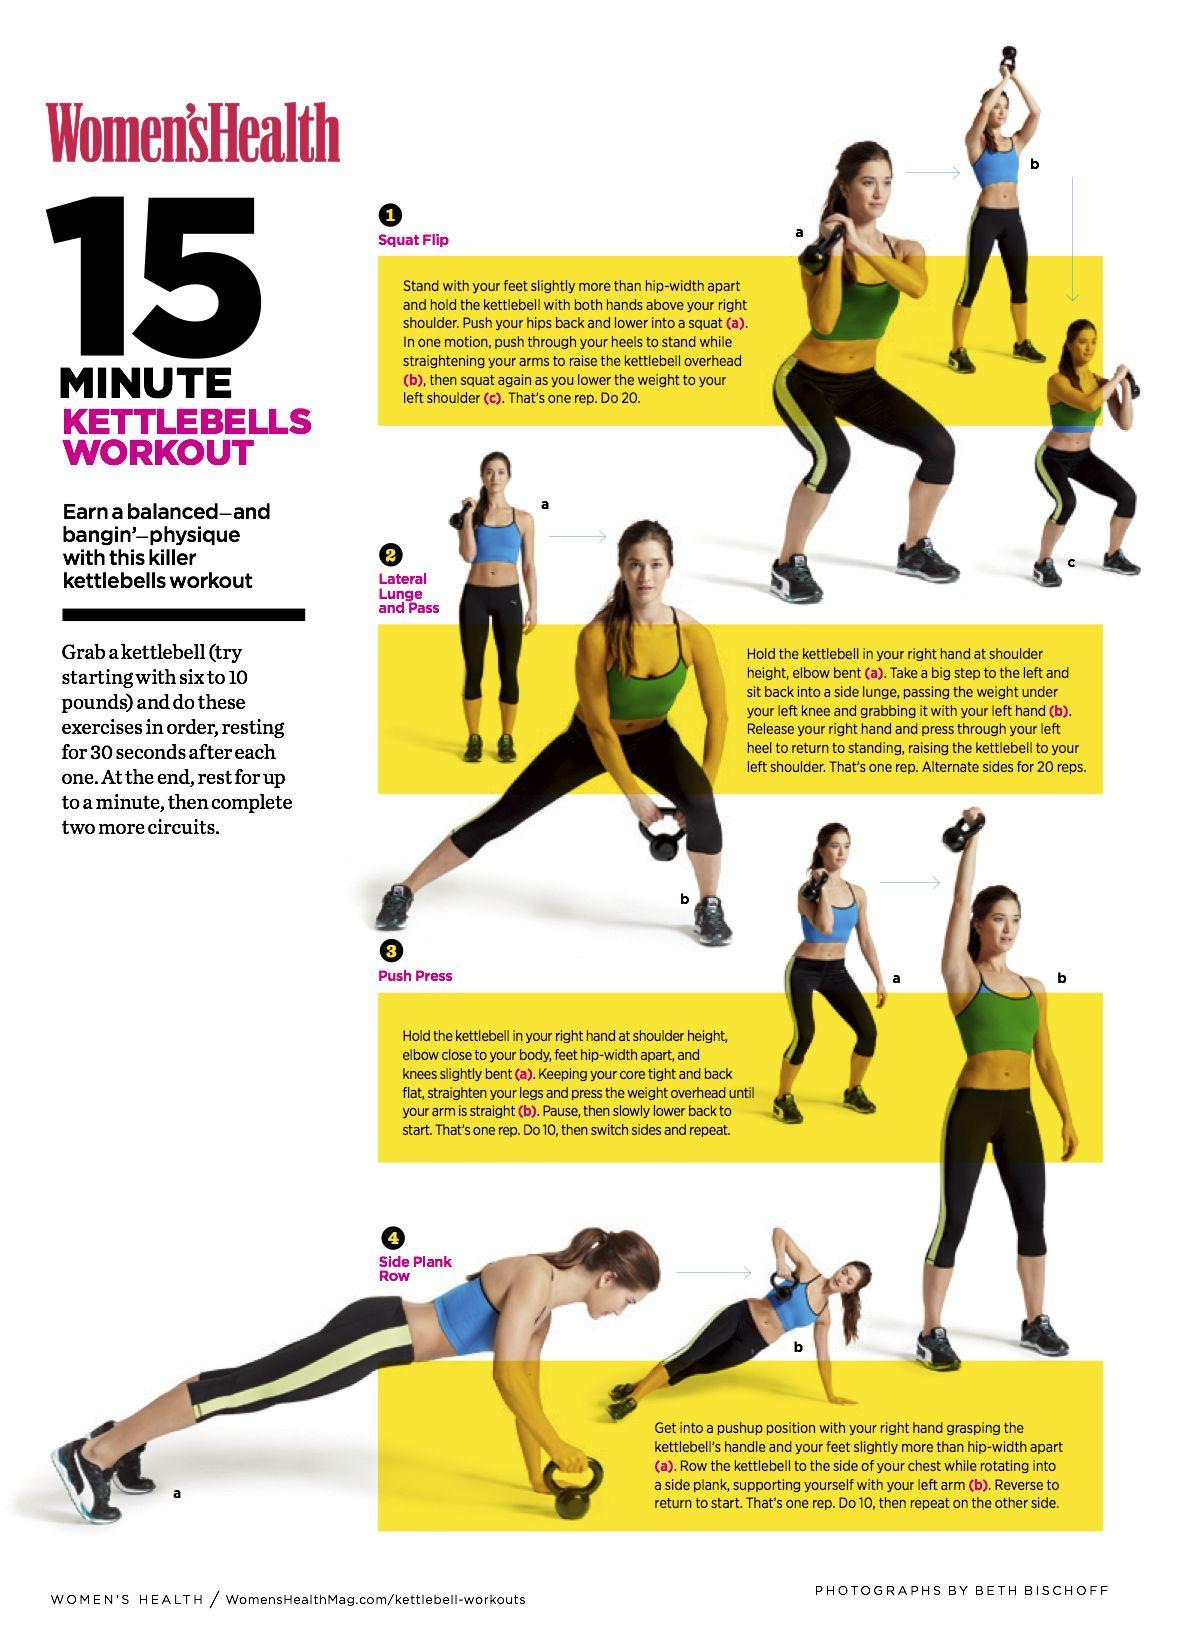 15 Minute Kettlebells Workout 15 Minute Kettlebells Workout new pictures